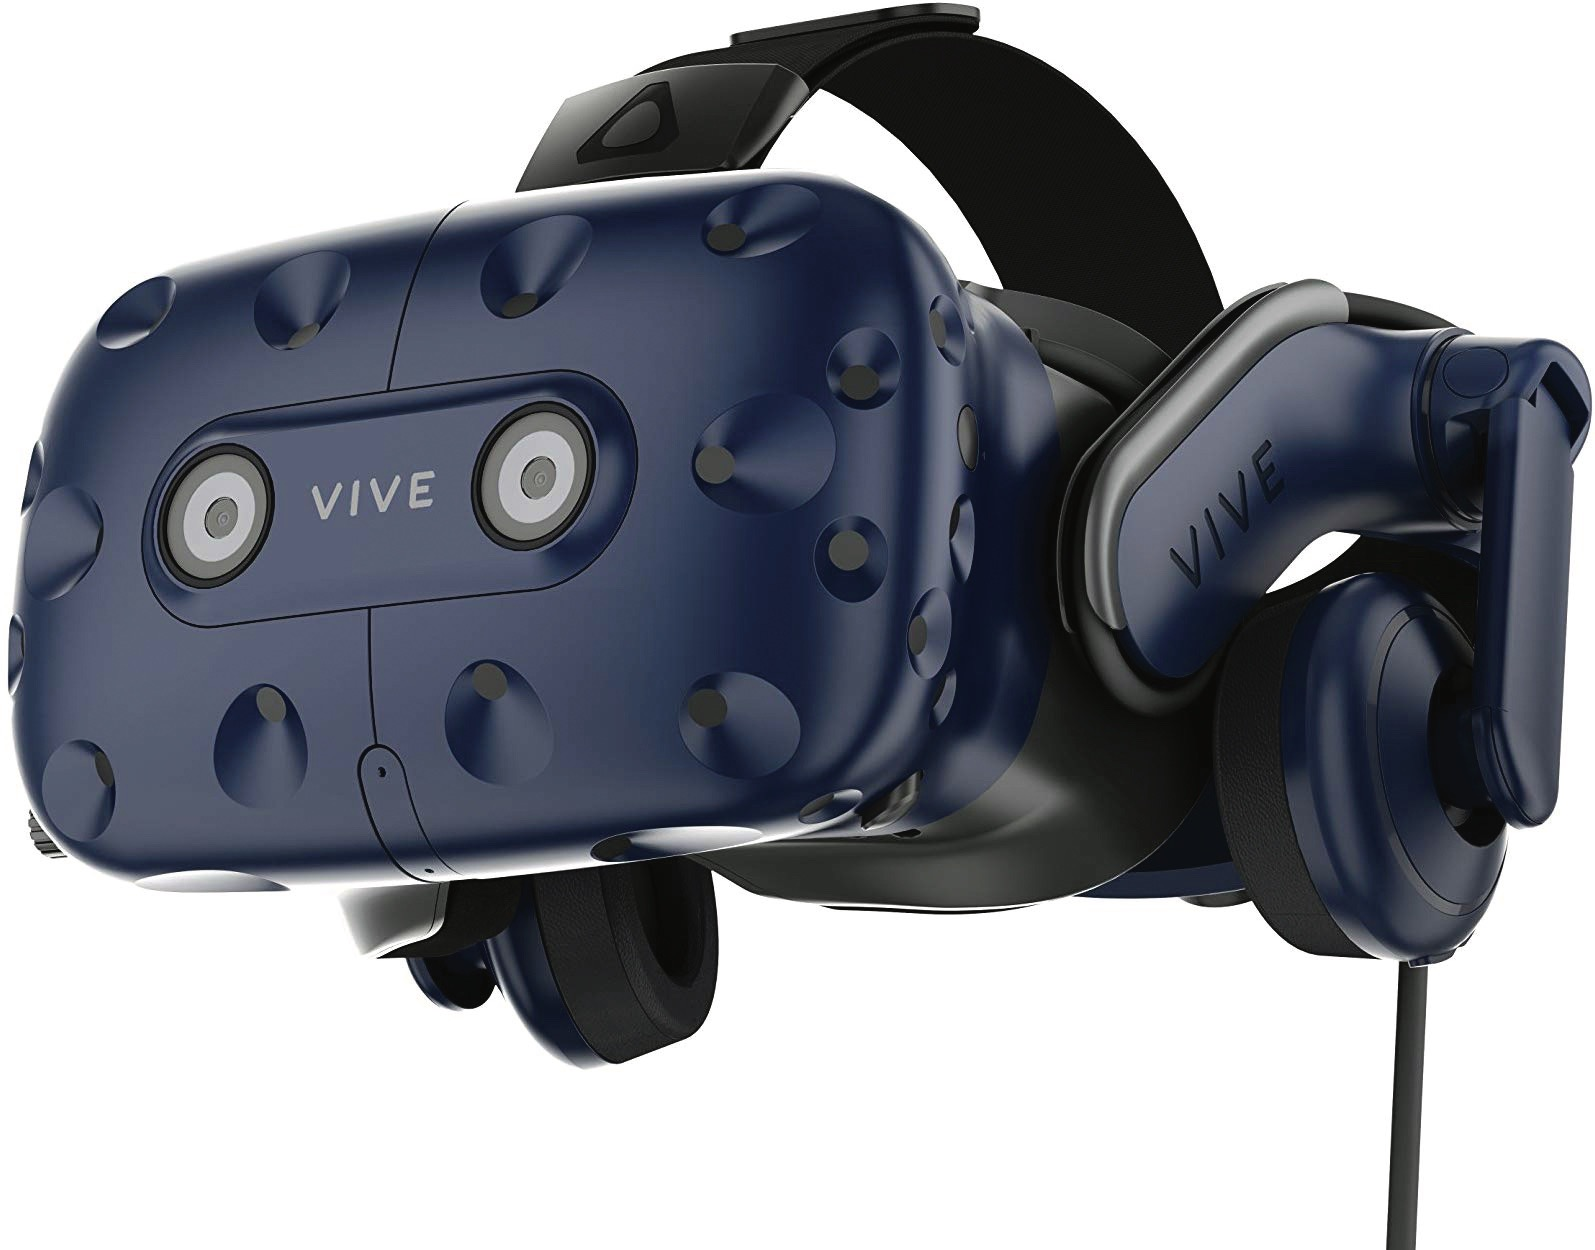 Hampton Police Department using virtual reality